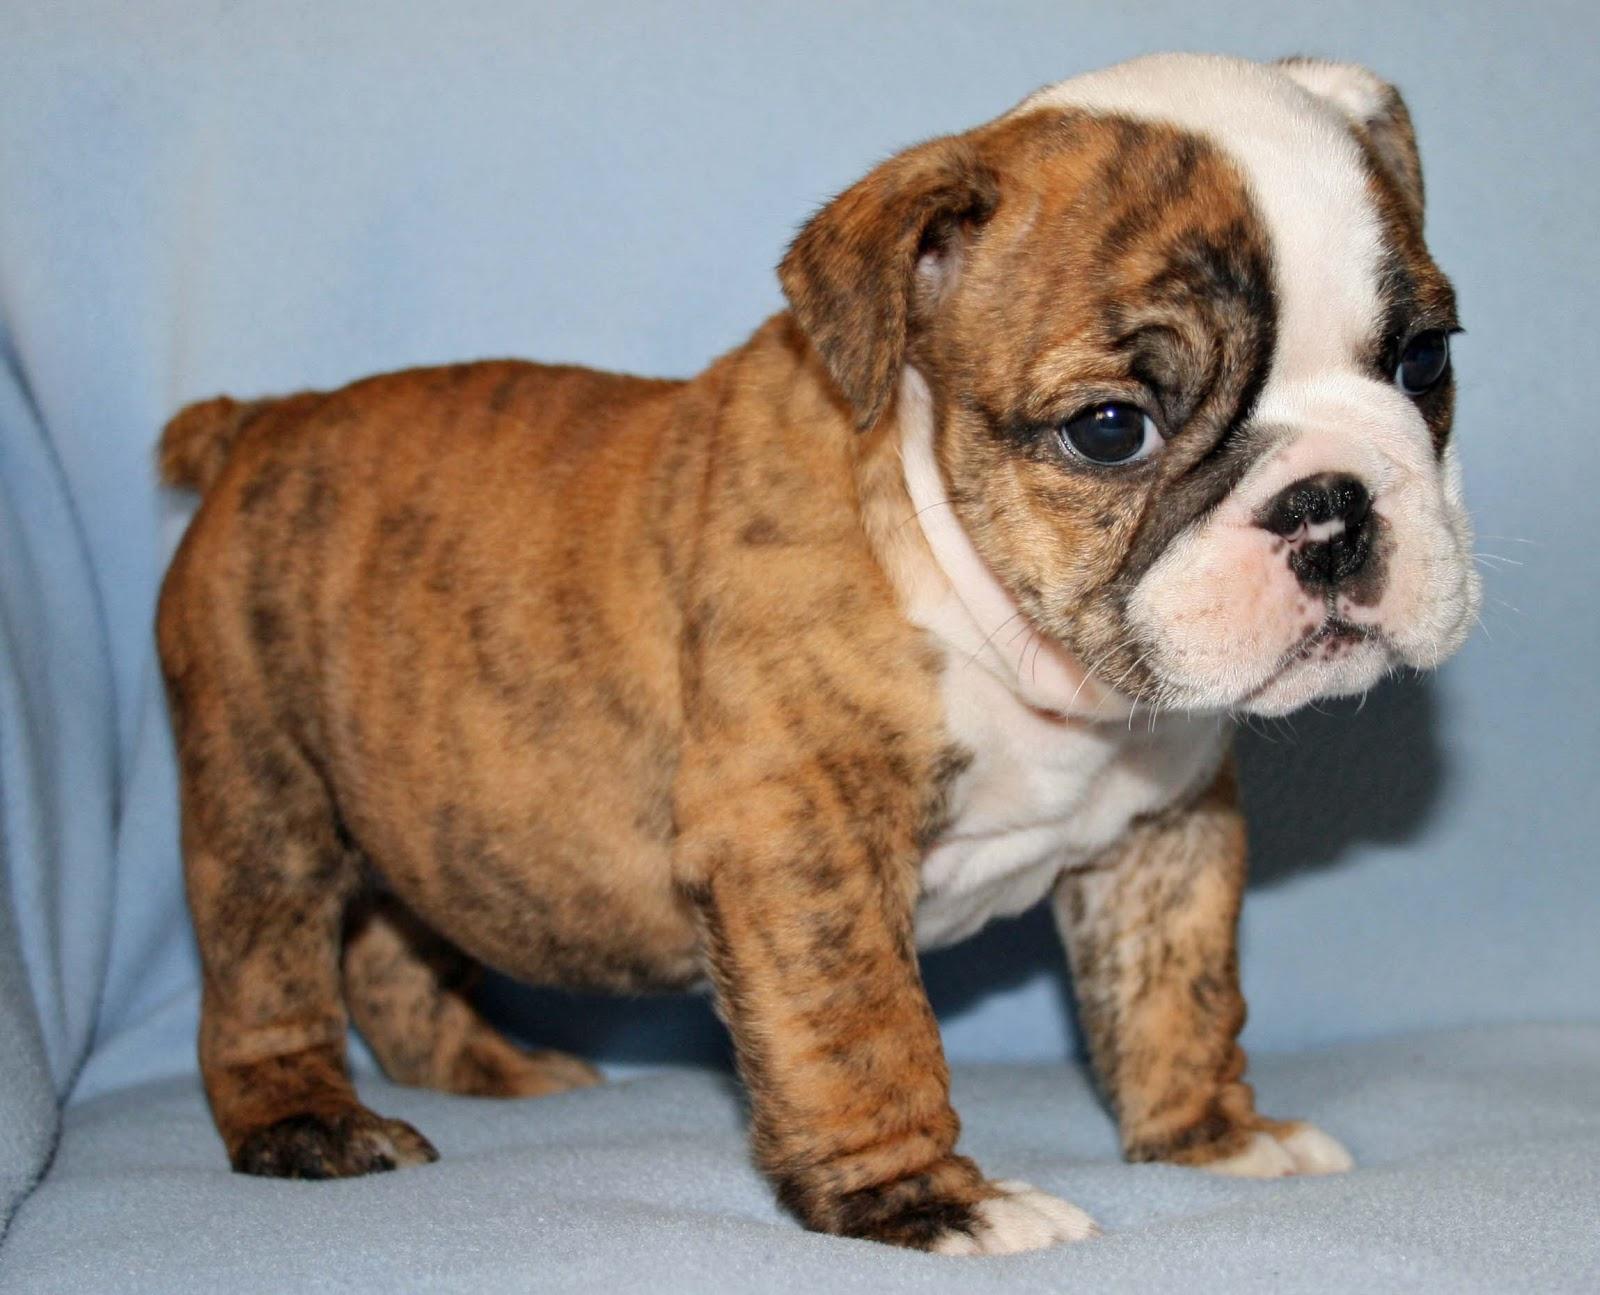 Cute Puppy Dogs: english bulldog puppies